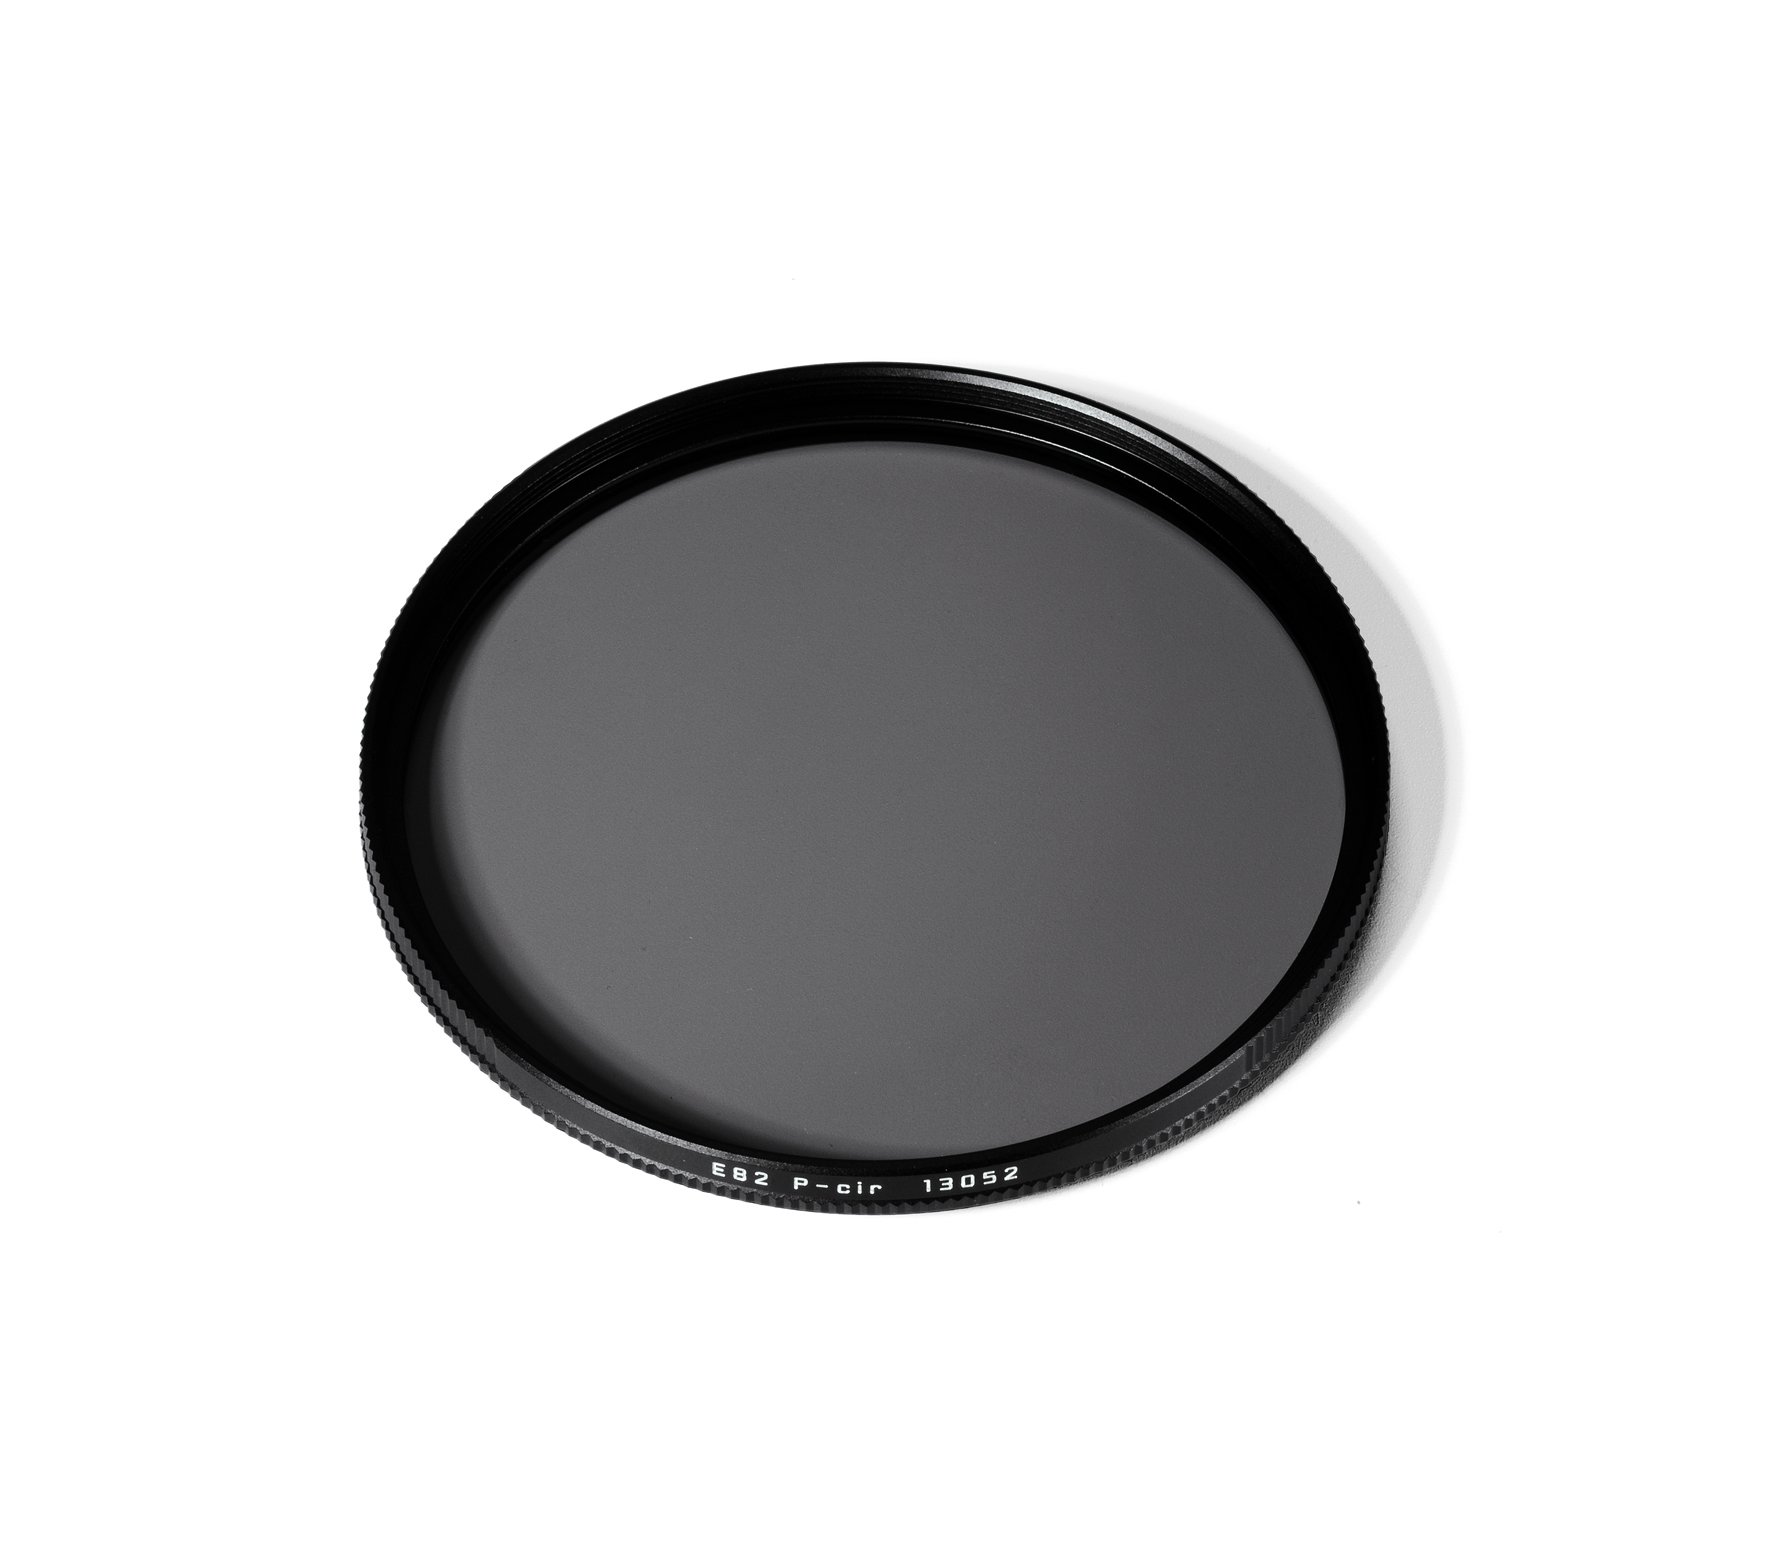 LEICA filtr ND 16x 82 mm